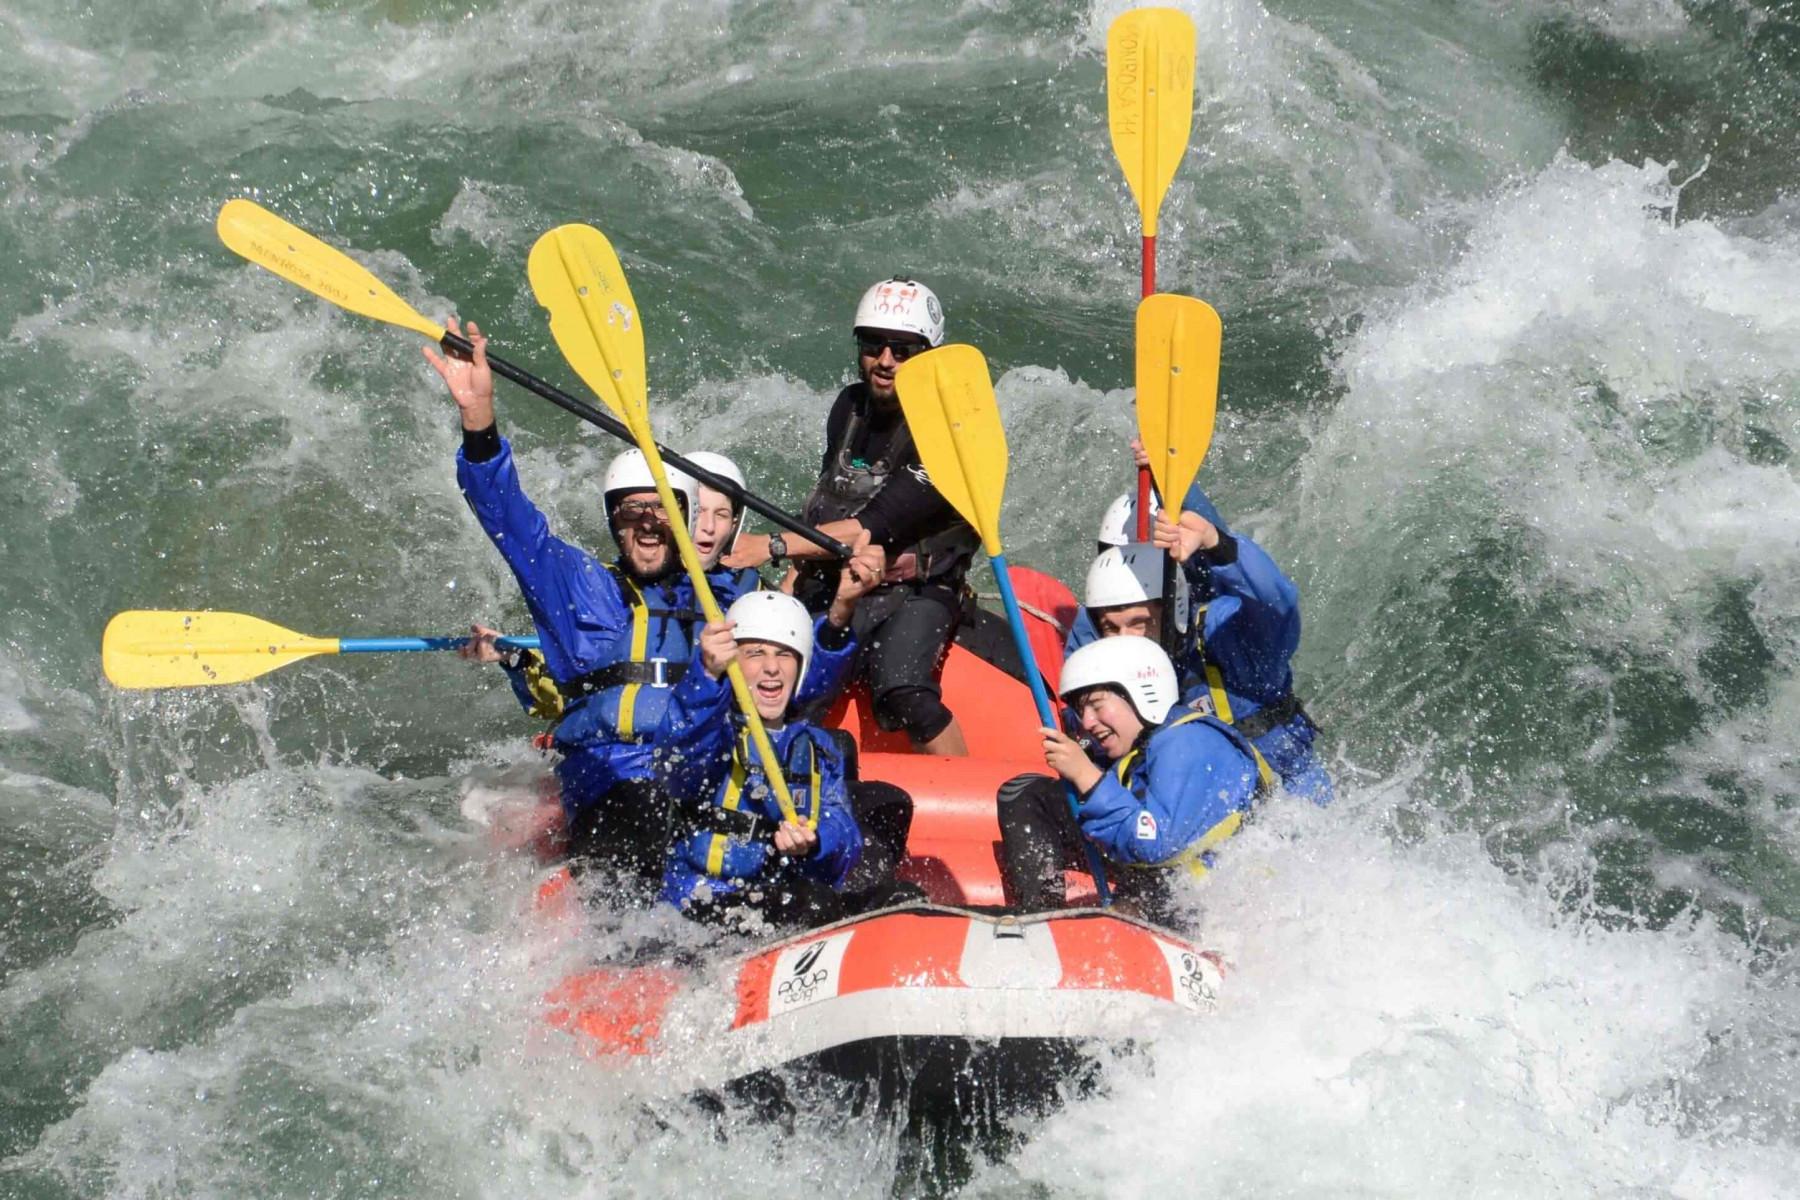 Discesa in Rafting Classico sul Sesia